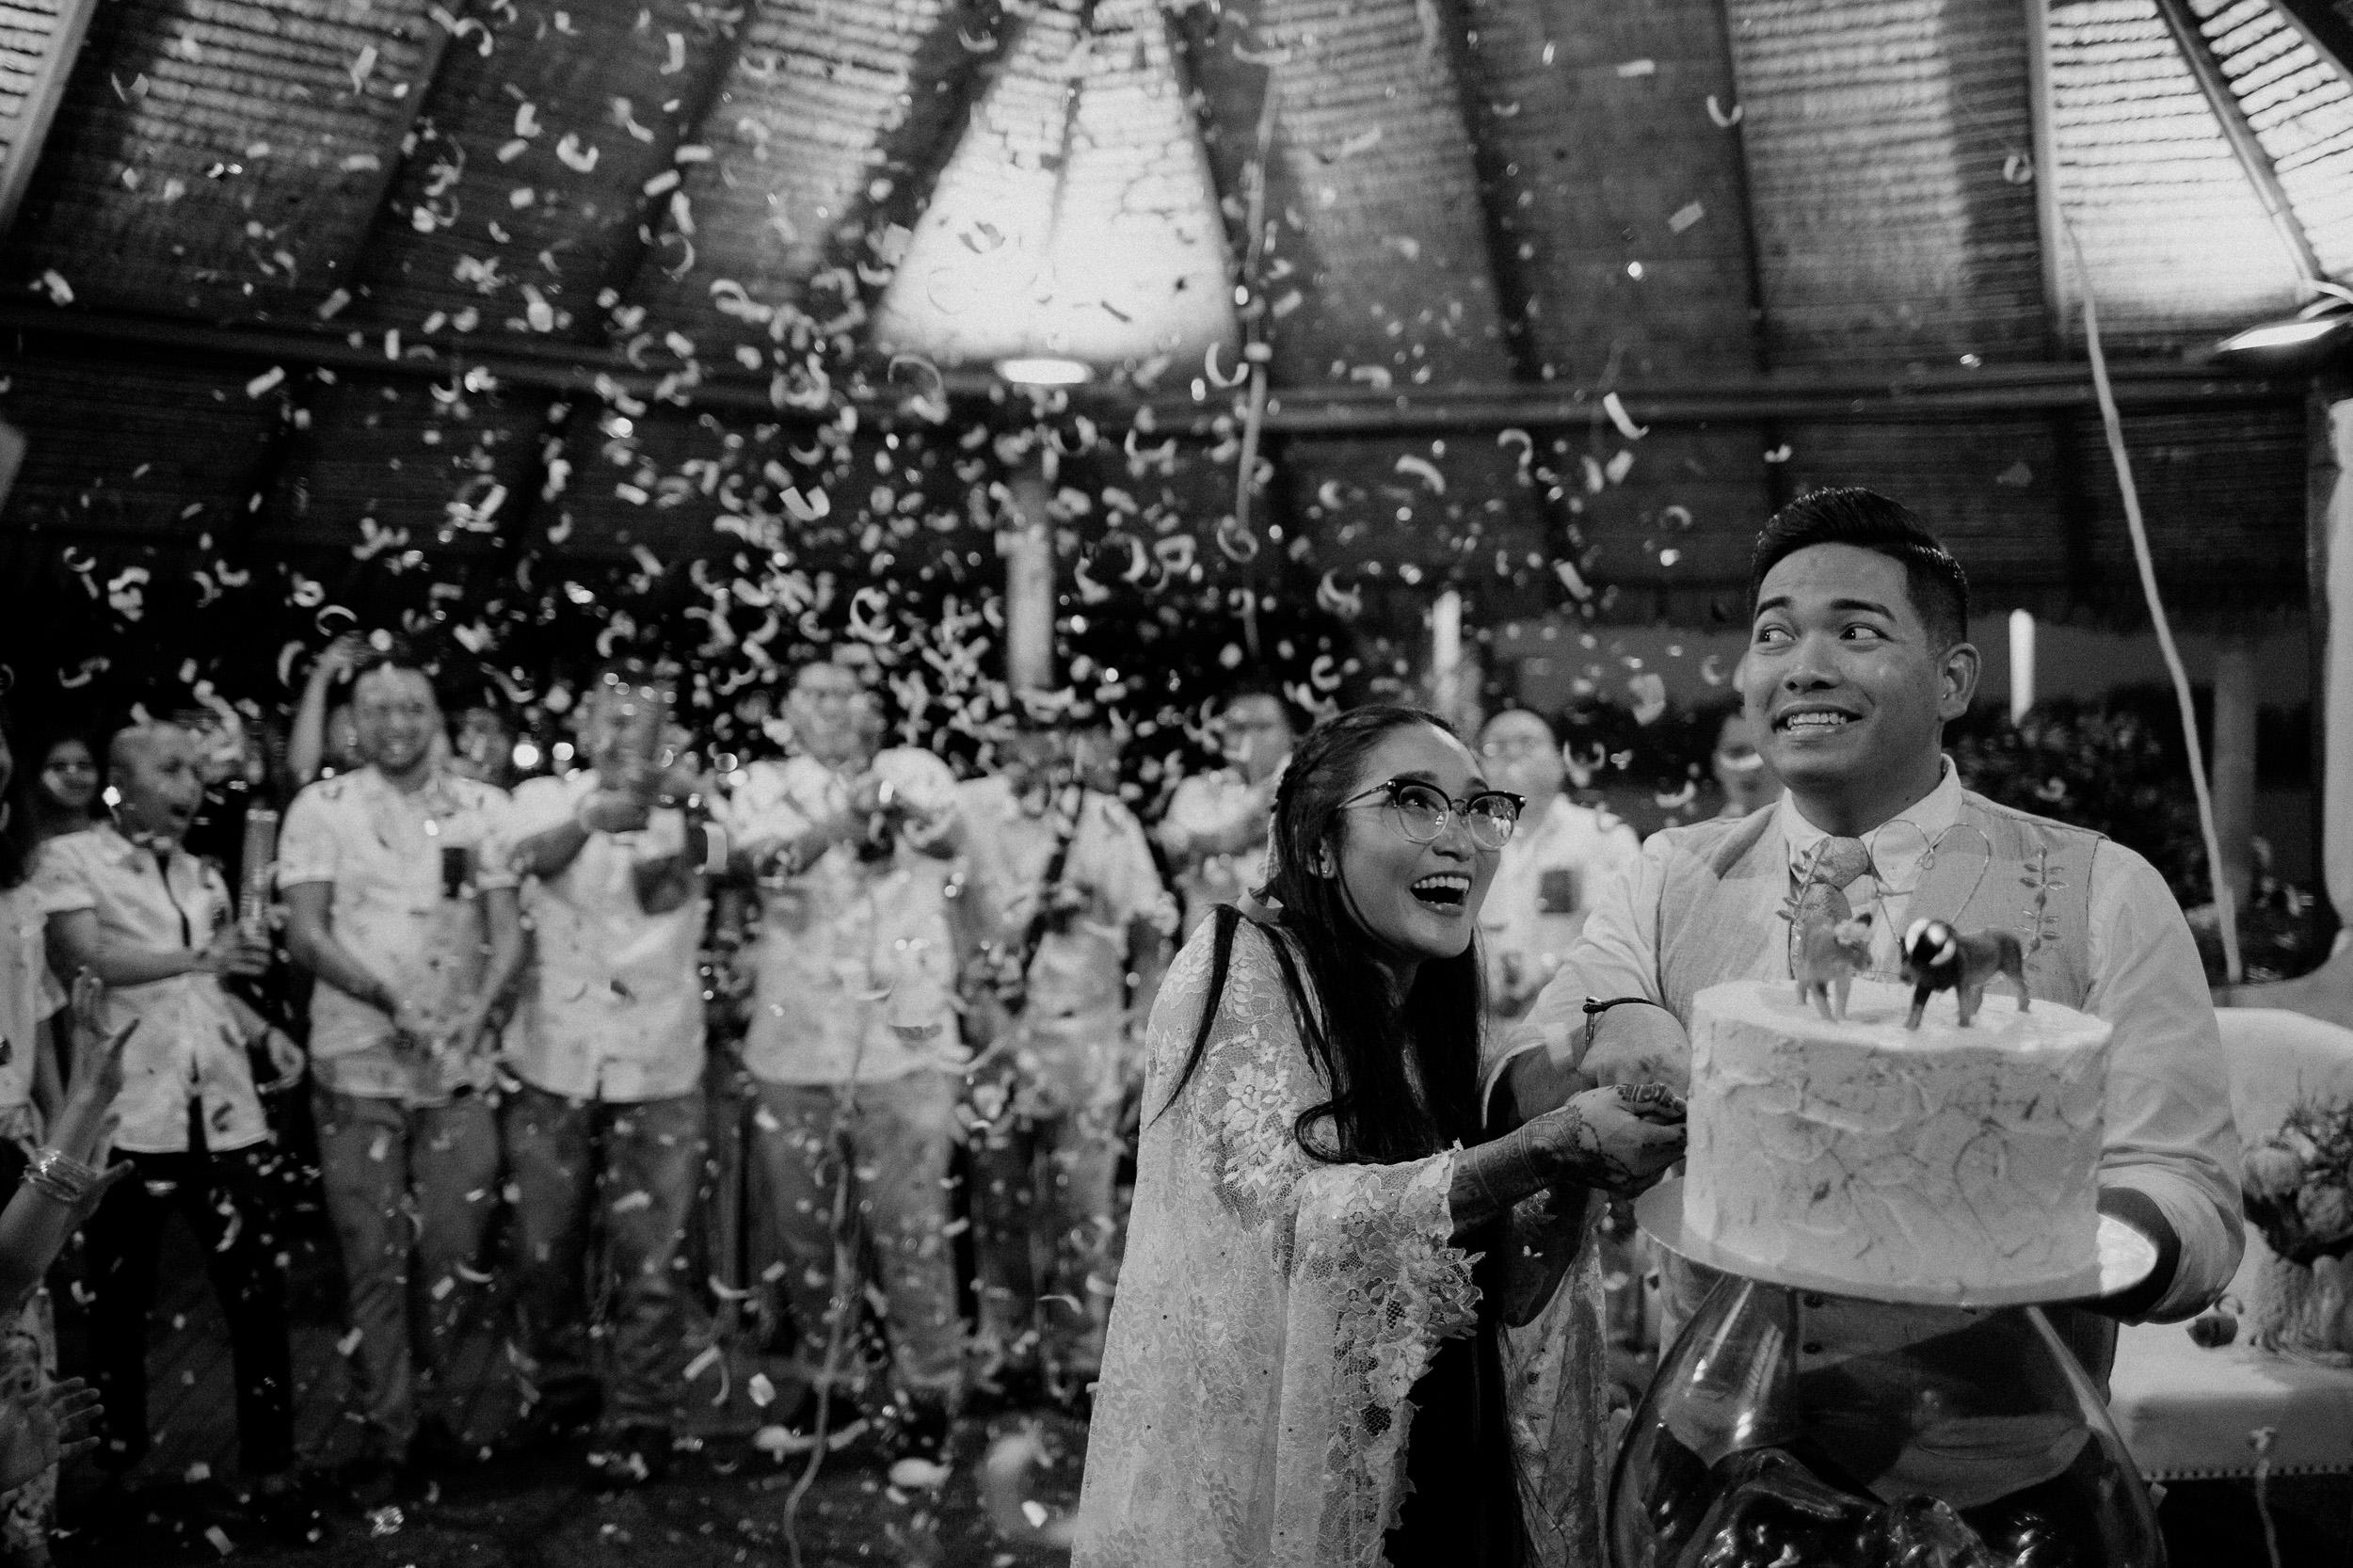 singapore-wedding-photographer-photography-wmt2017-156.jpg